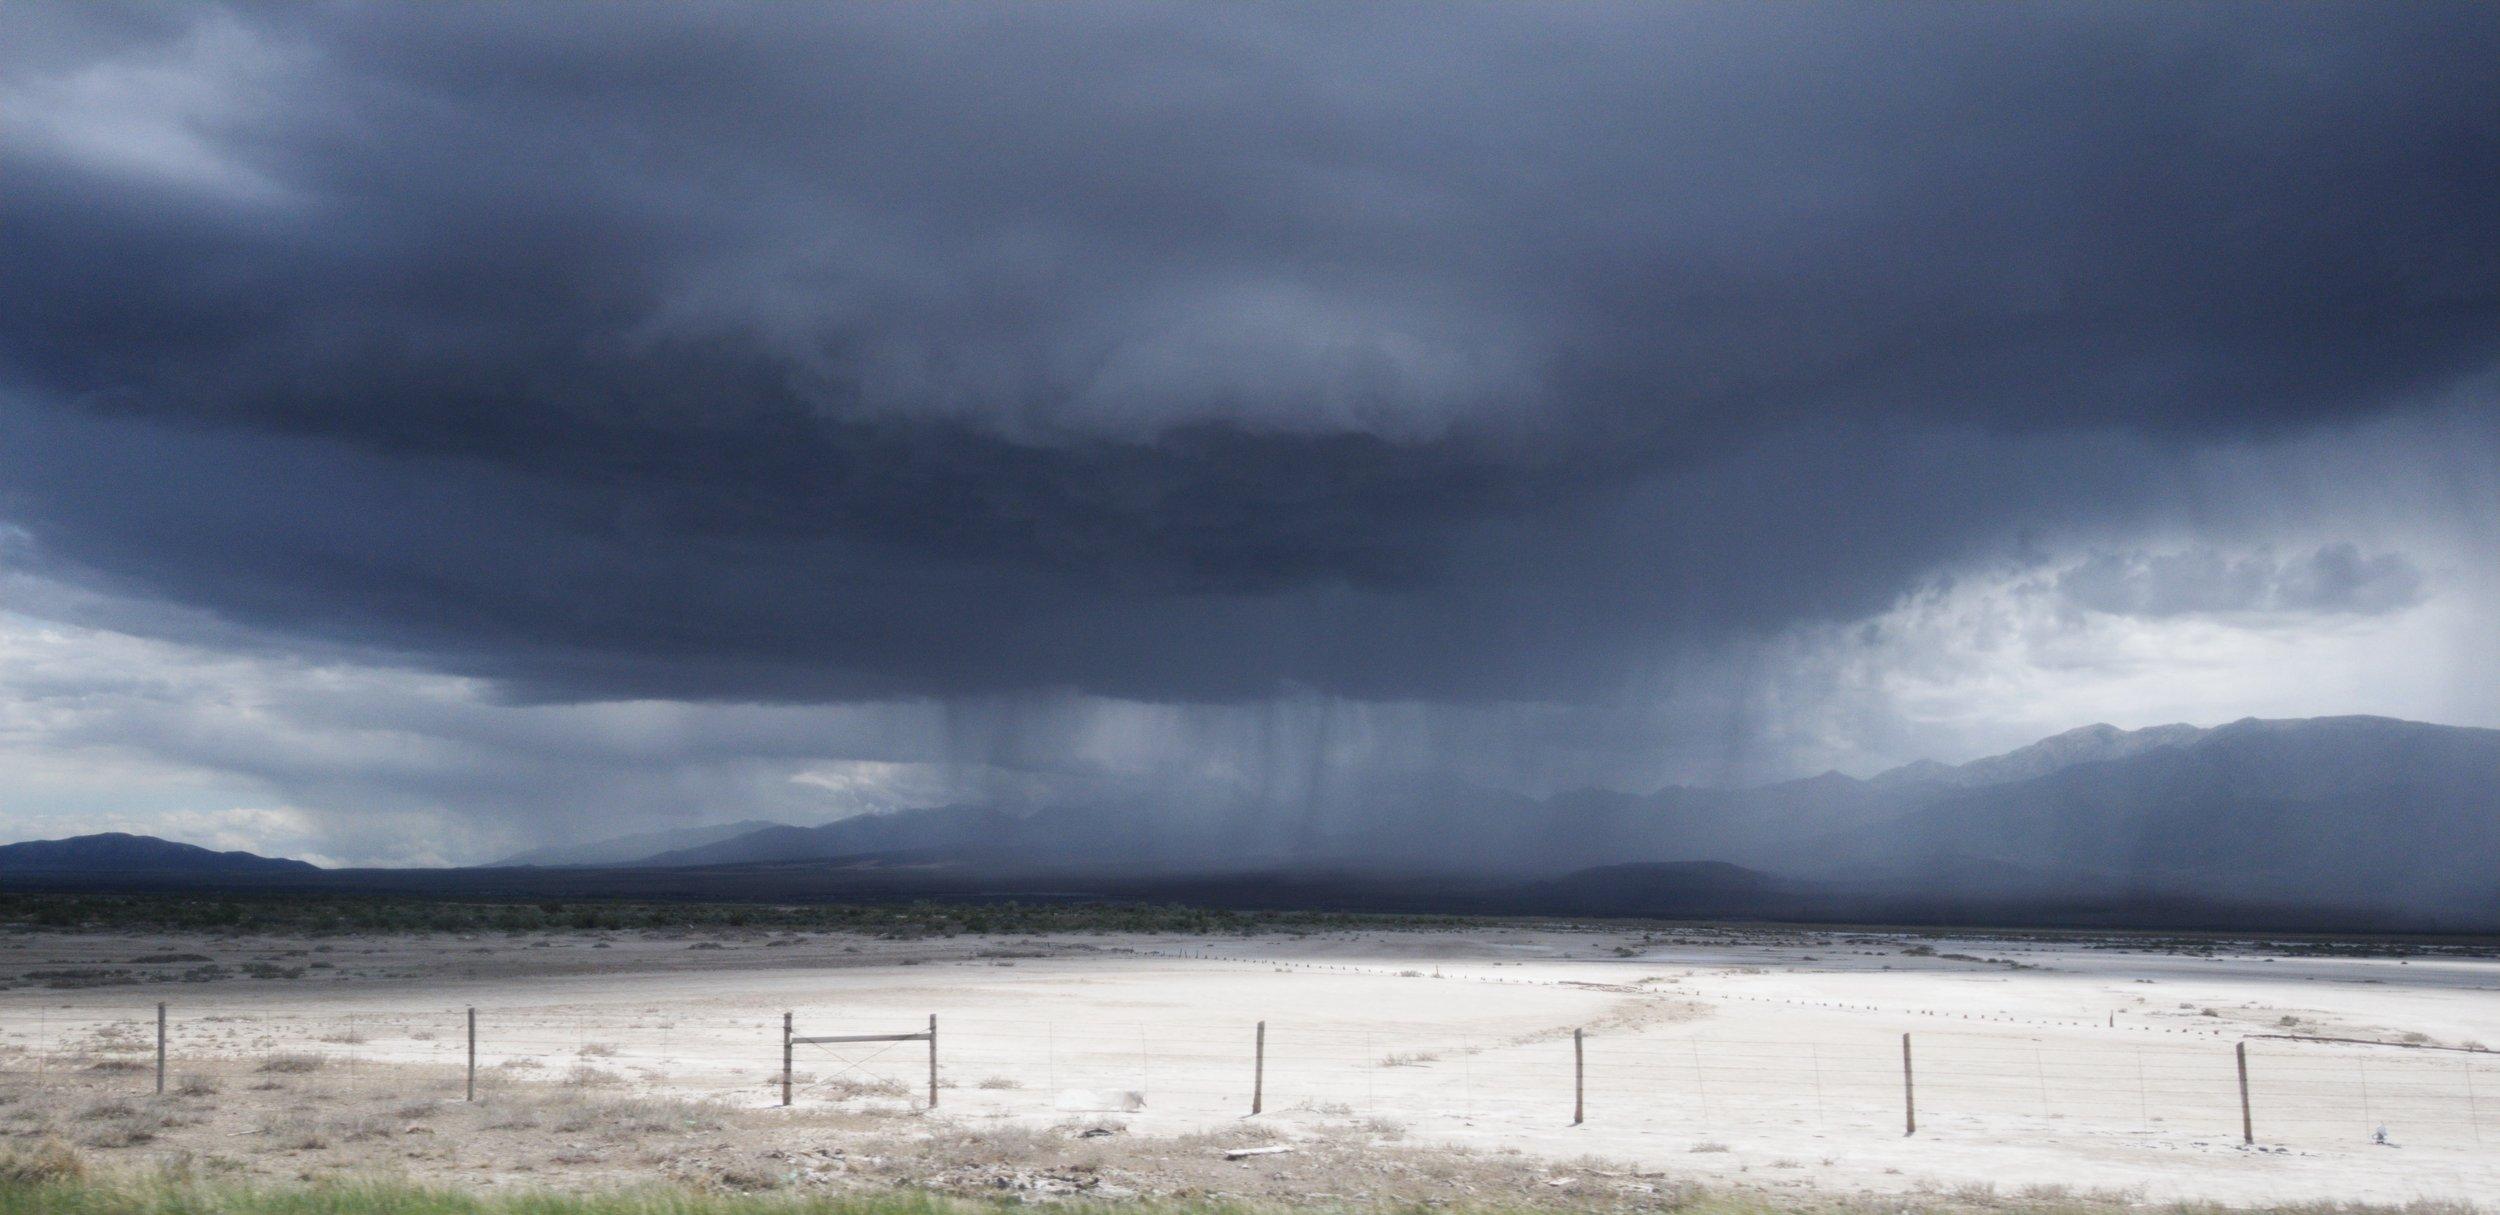 Storm over Bonneville Salt Flats, Utah